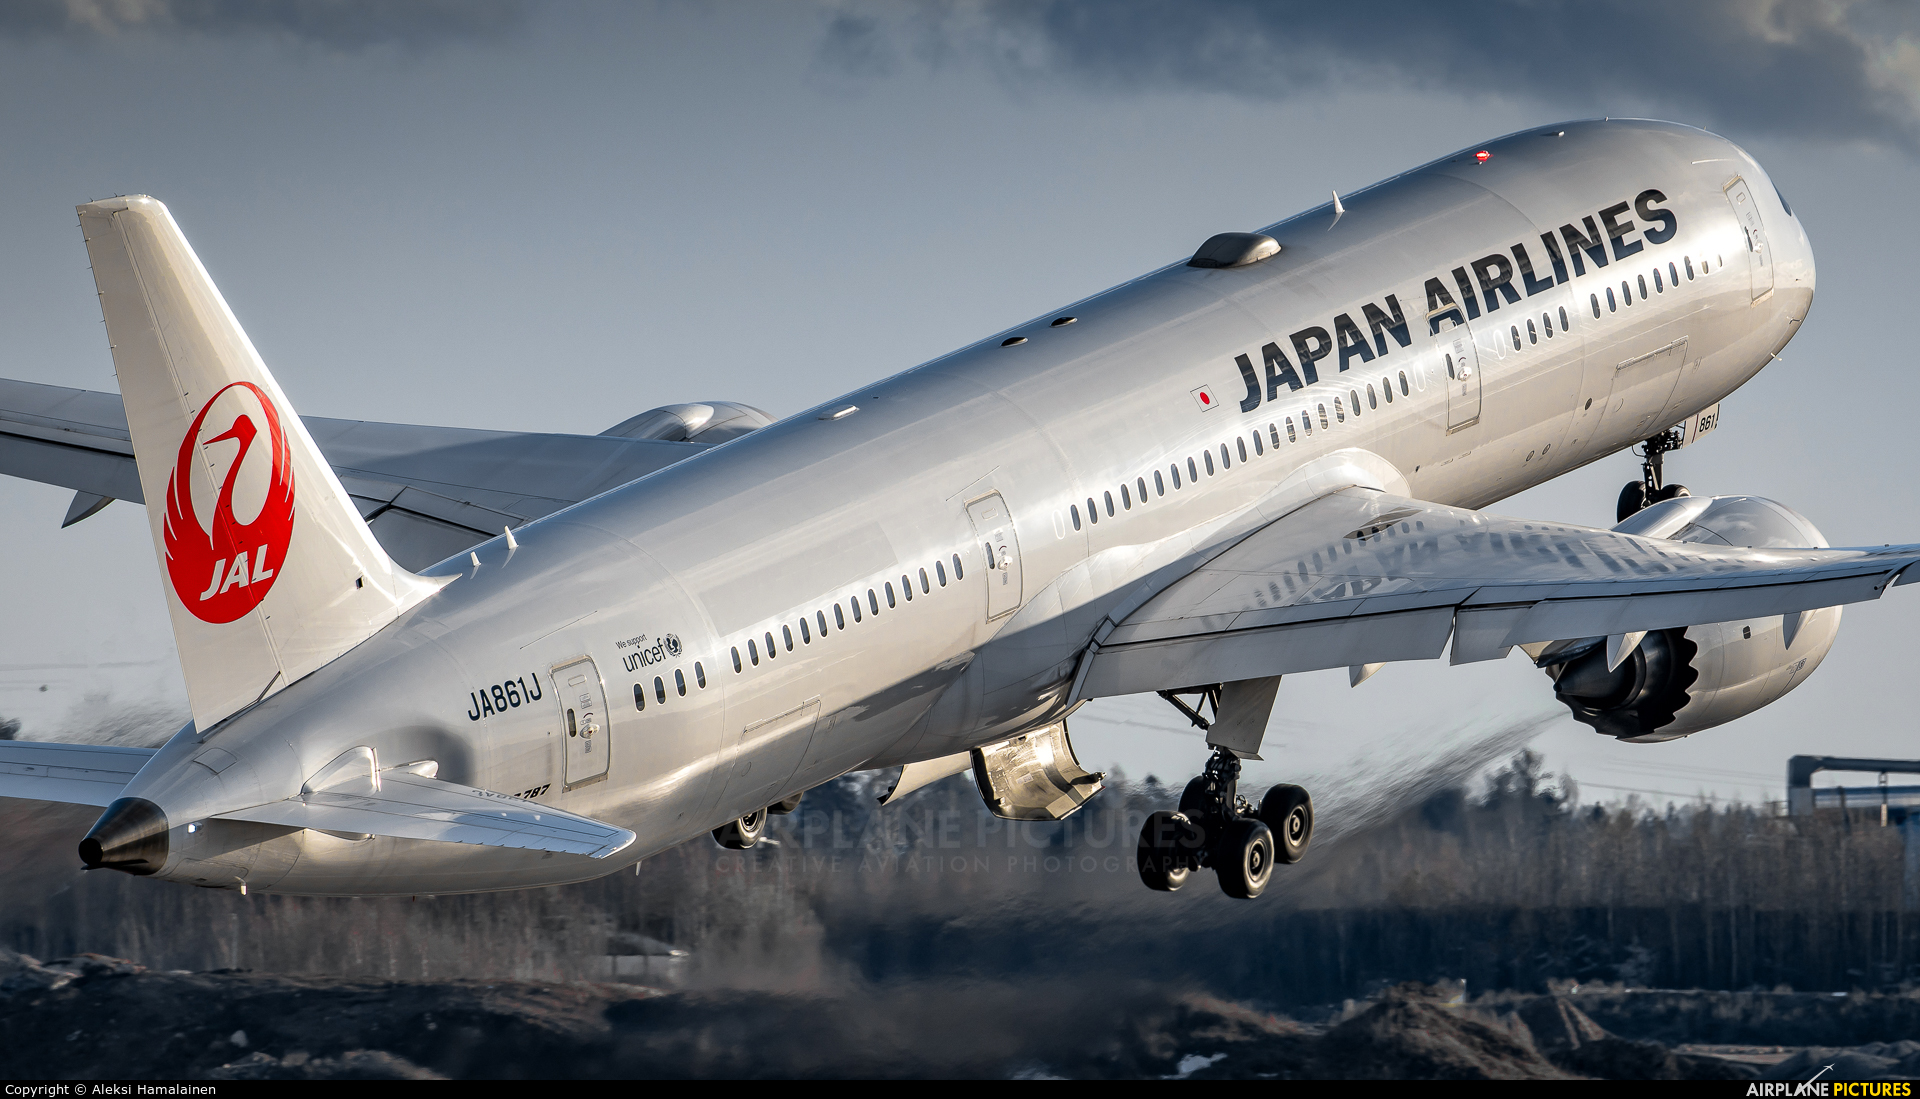 JAL - Japan Airlines JA861J aircraft at Helsinki - Vantaa